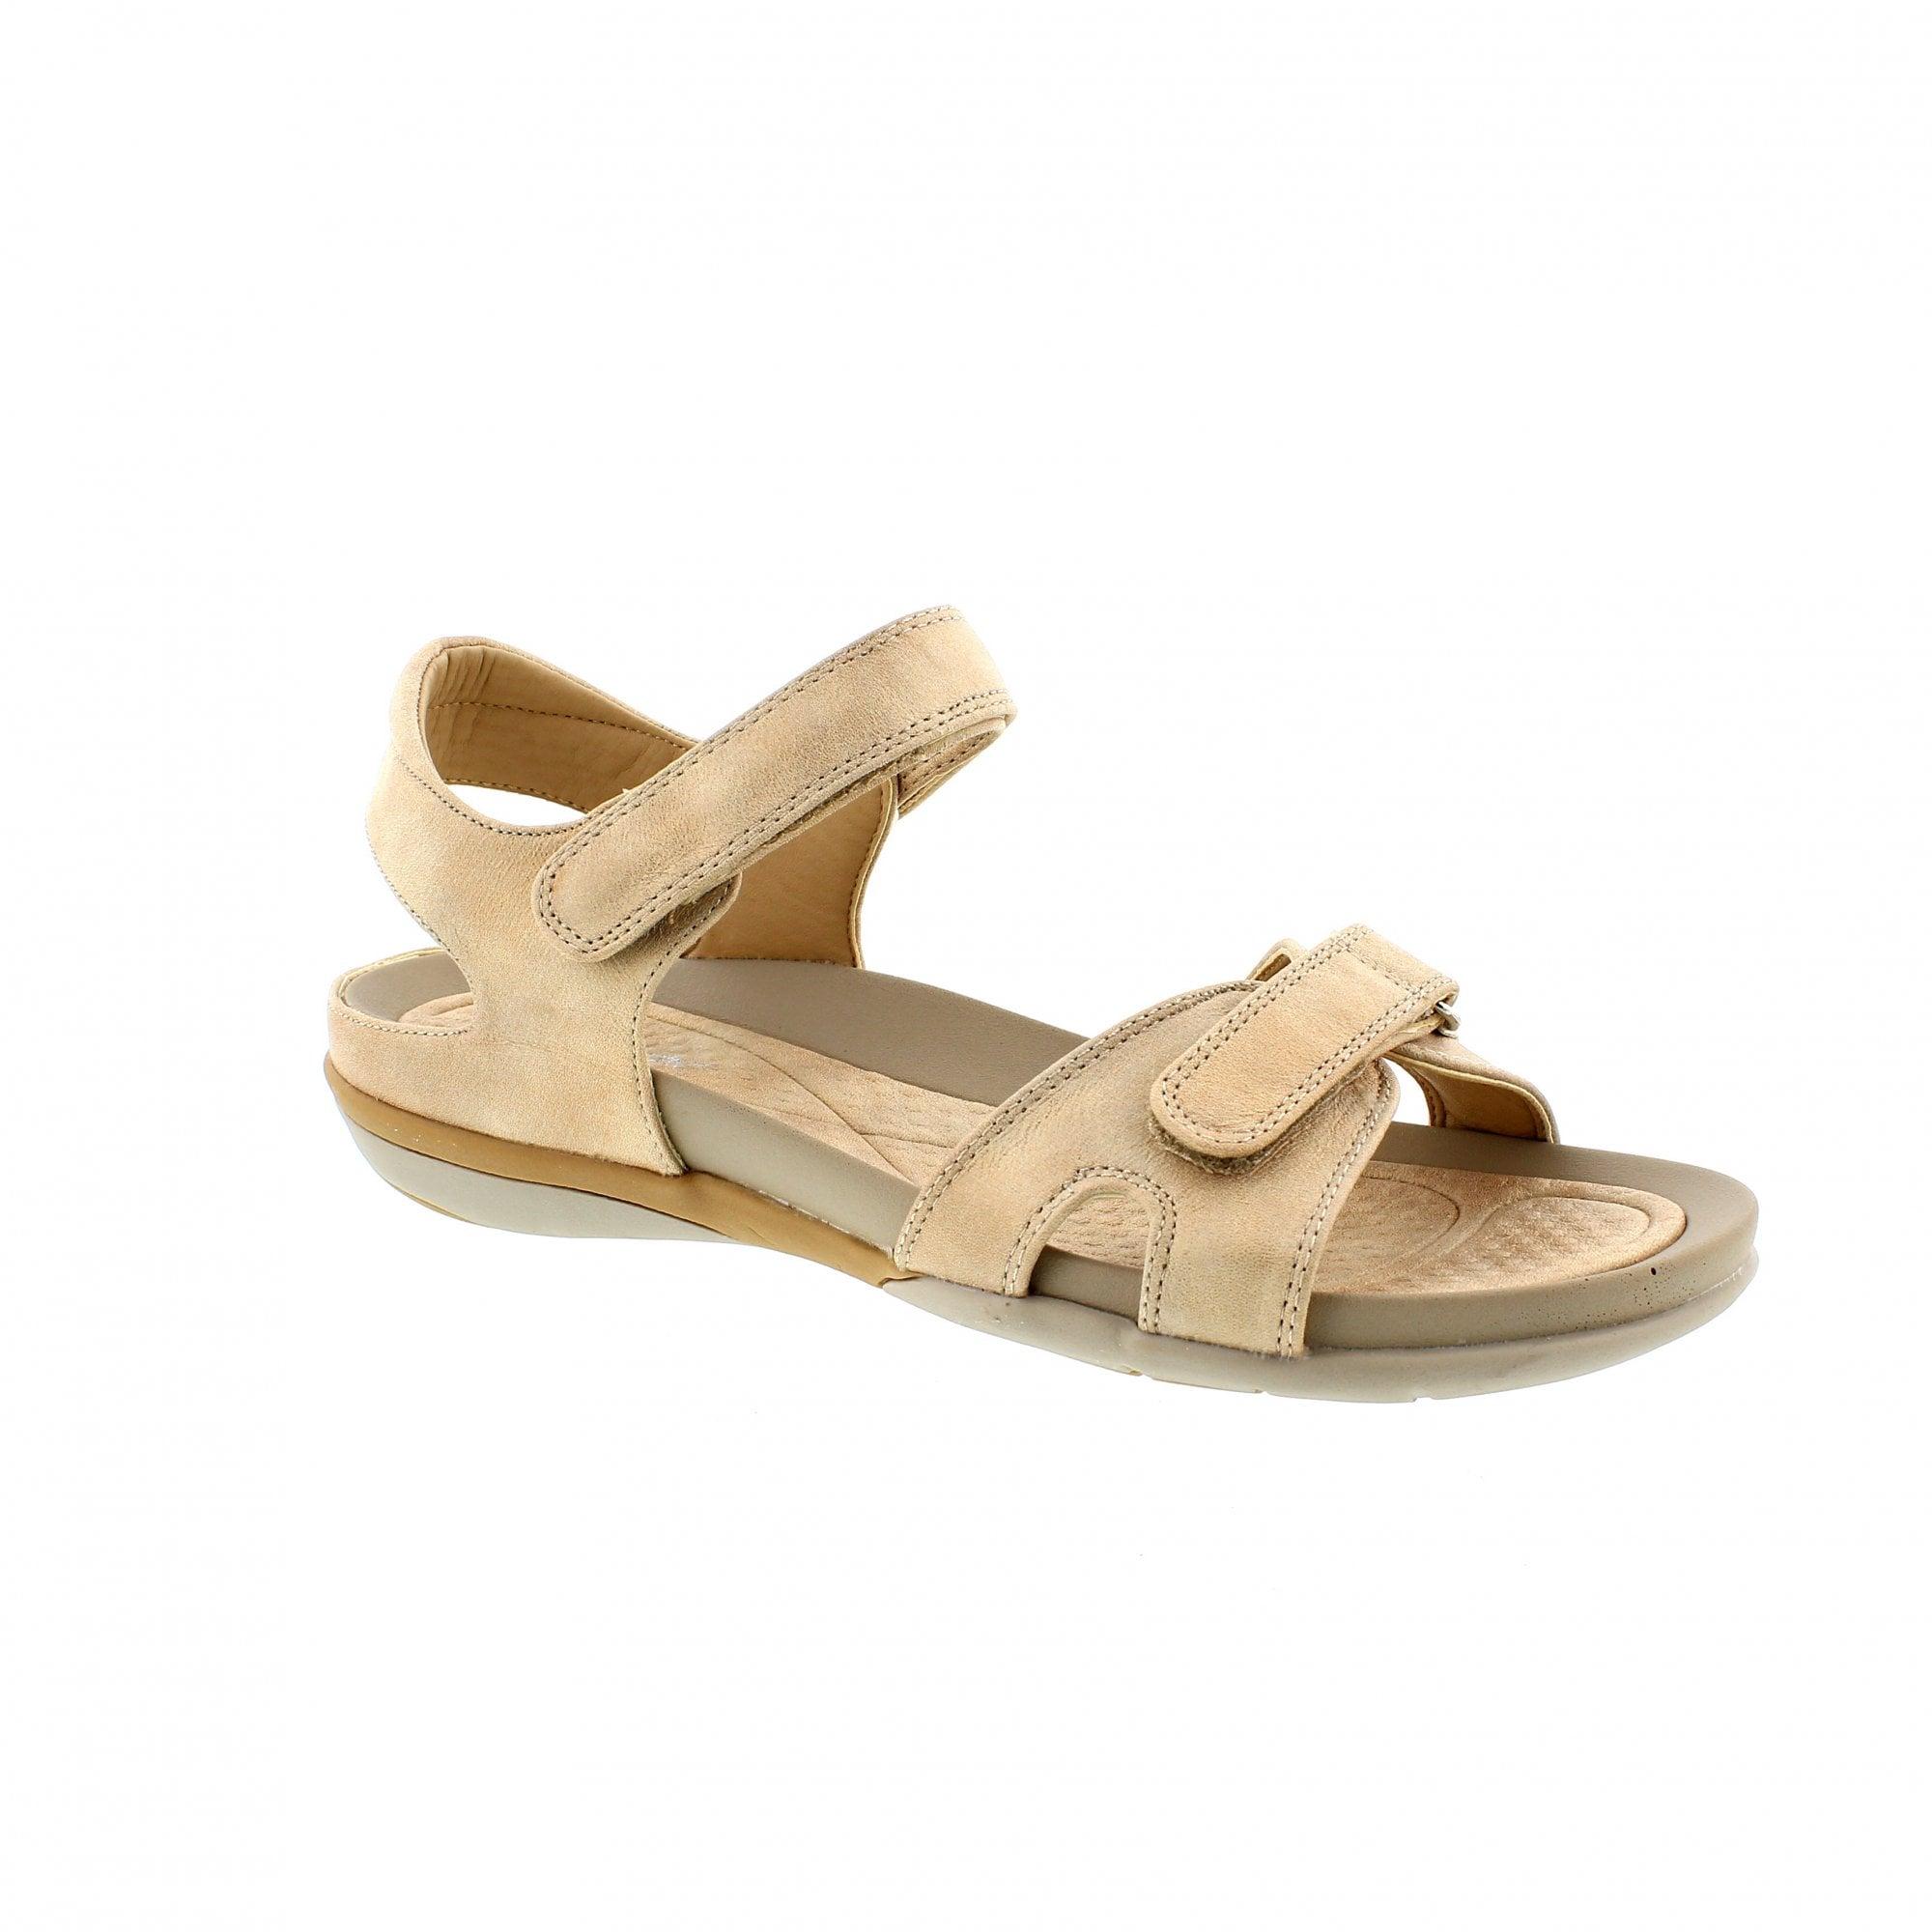 3fe89f3f8 Rieker V9462-62 Beige Womens Sandals